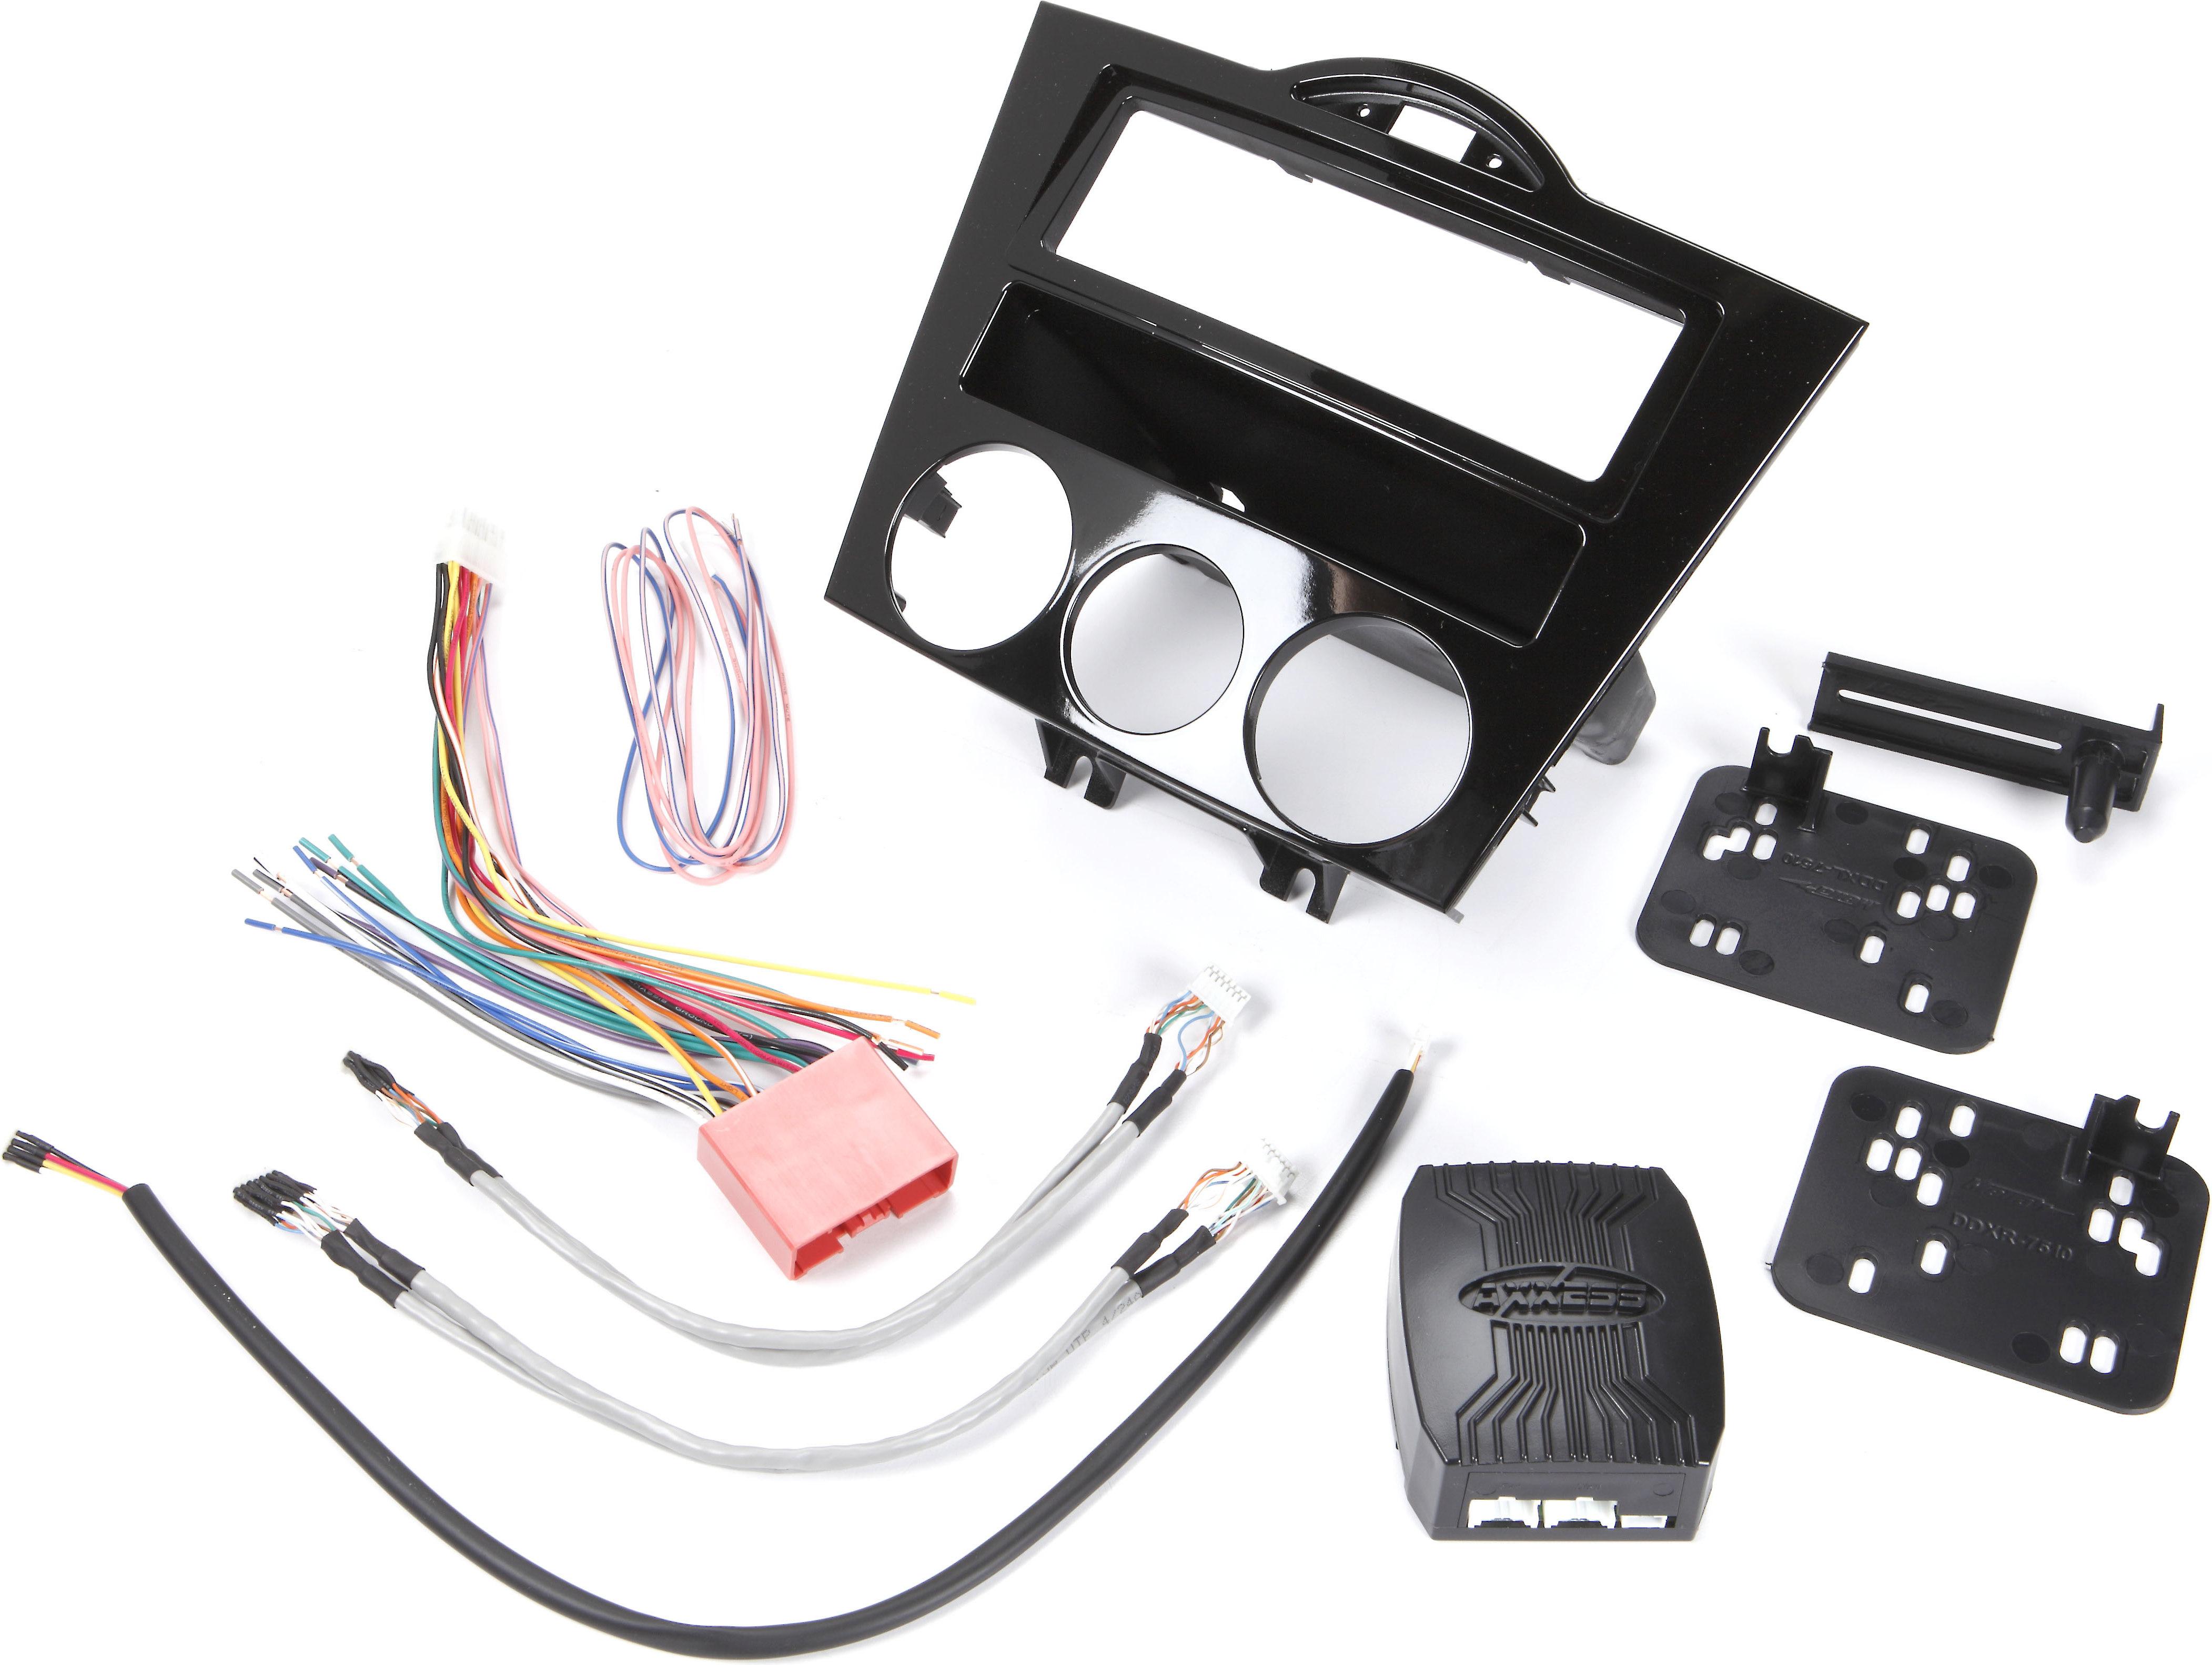 Fits Mazda RX8 2004-2008 Single DIN Aftermarket Harness Radio Install Dash Kit